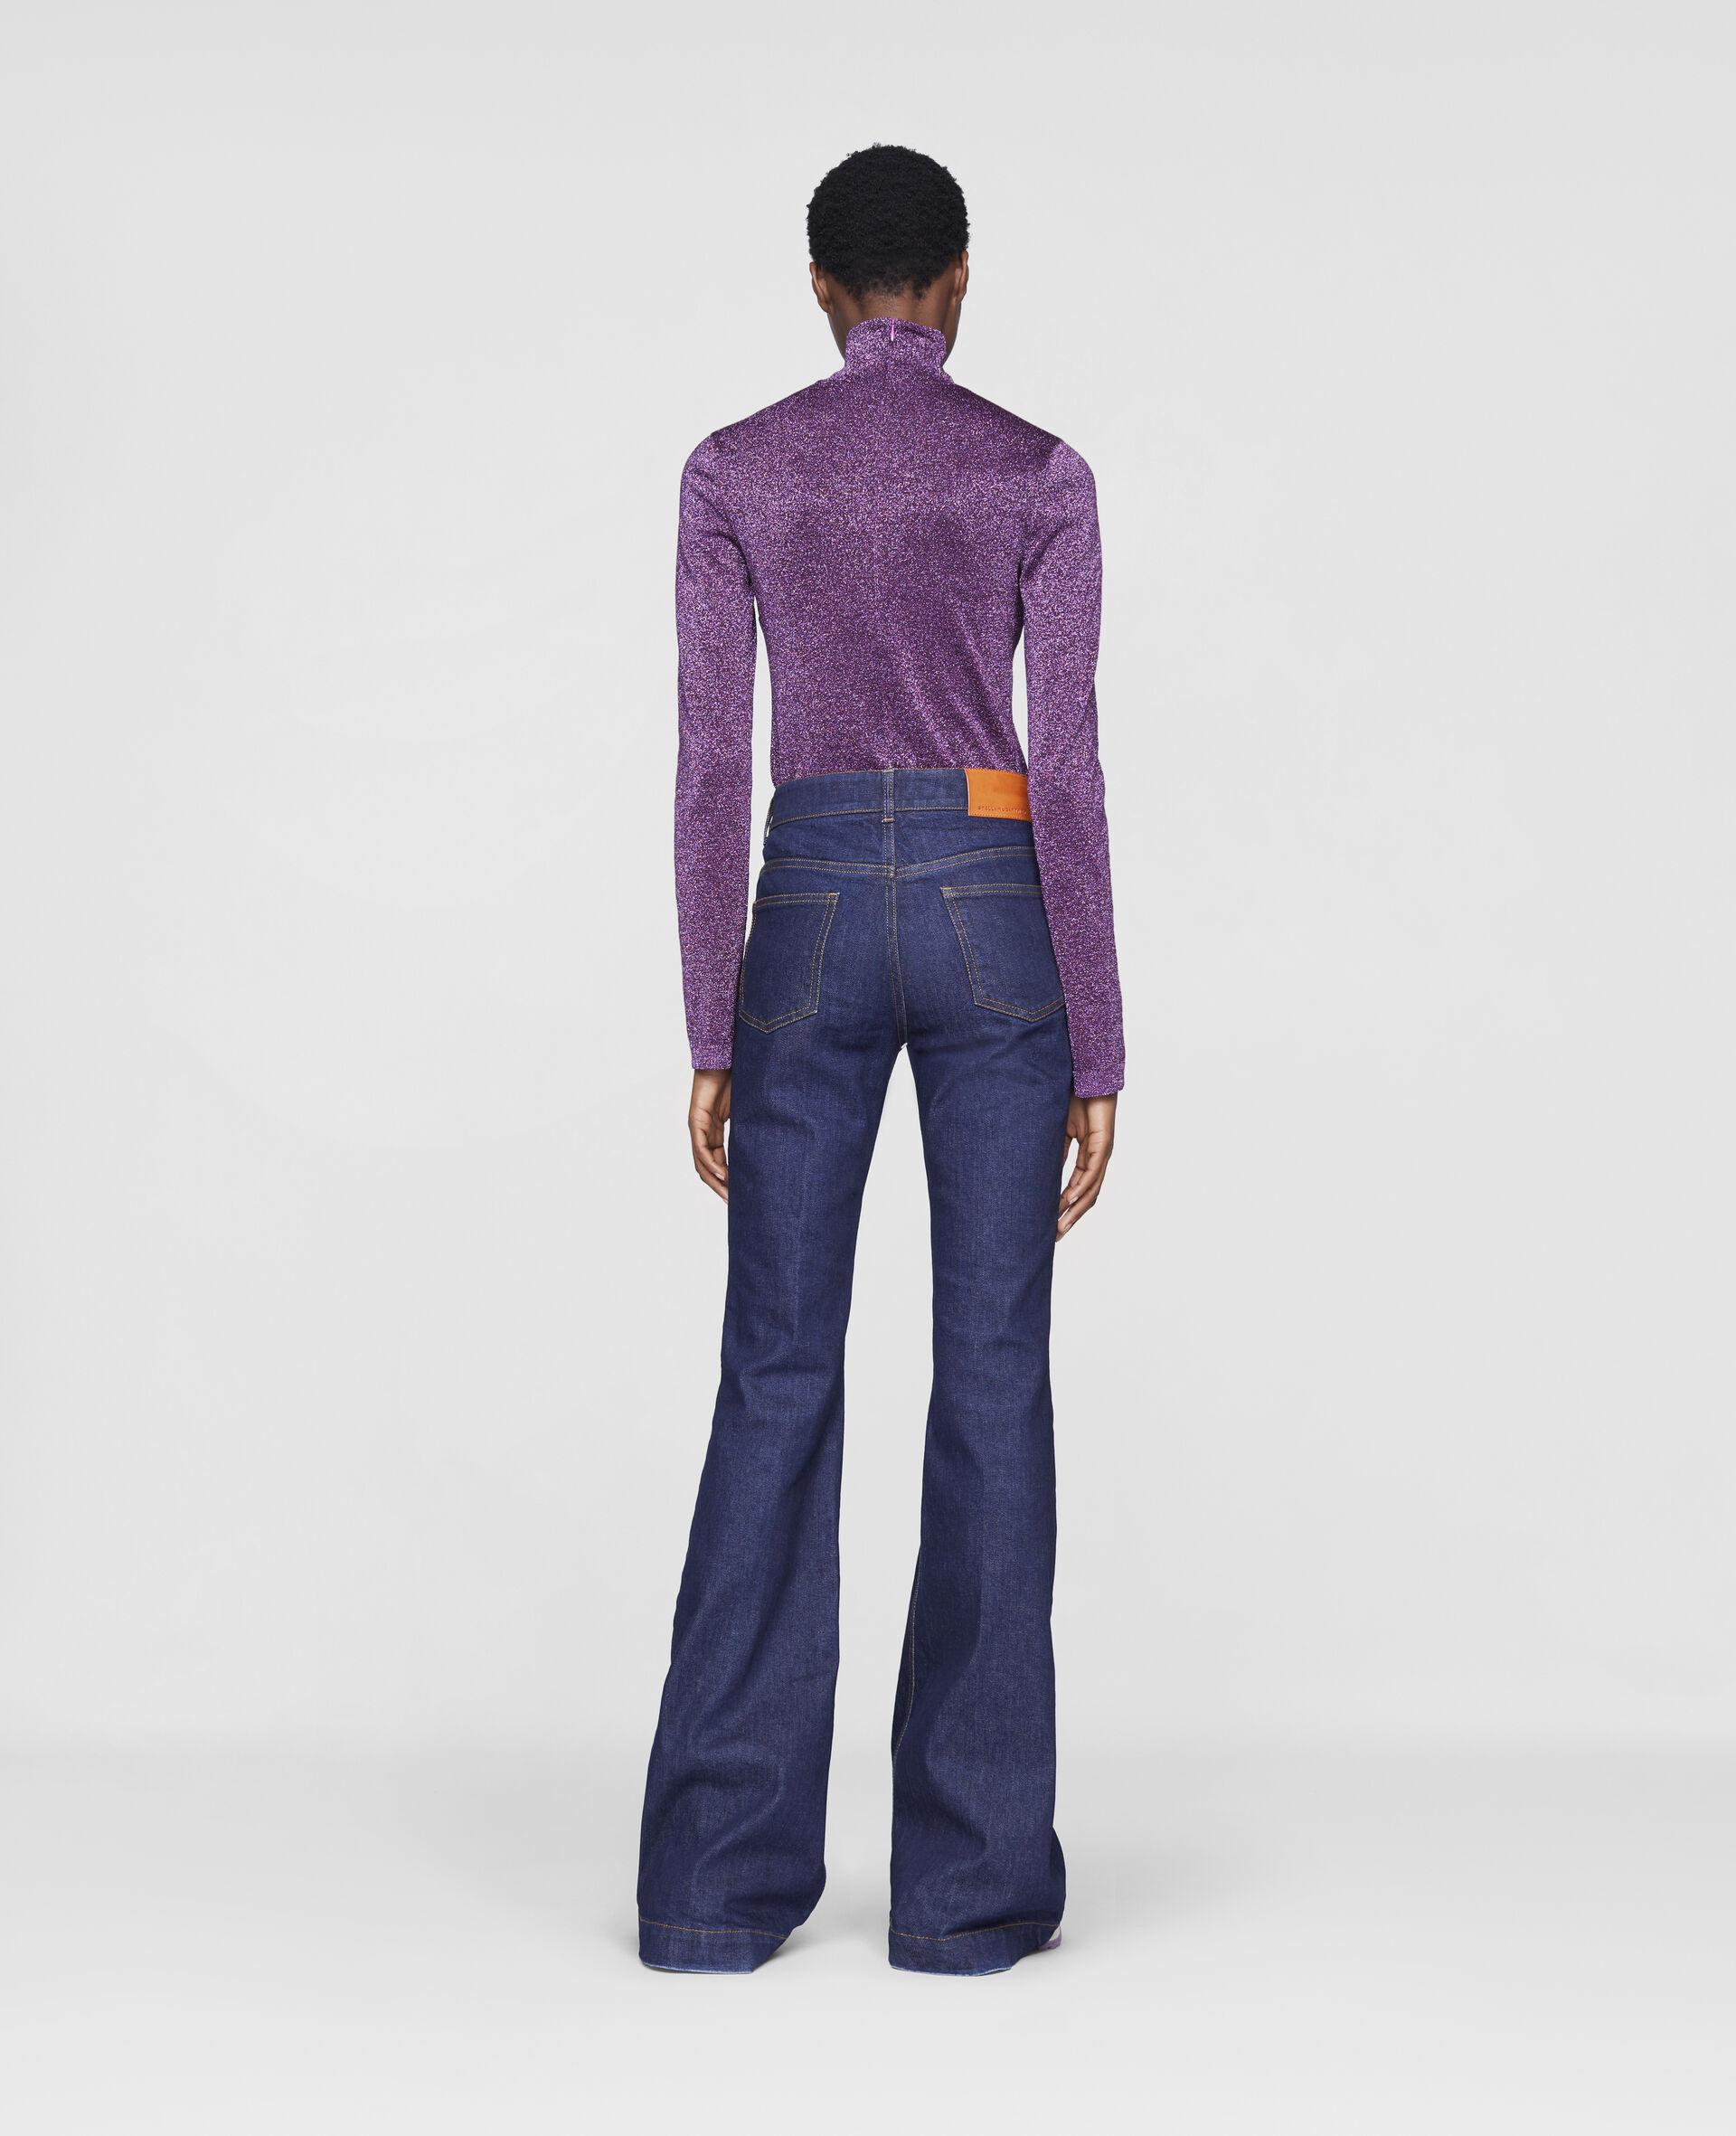 70 年代喇叭牛仔长裤-蓝色-large image number 2